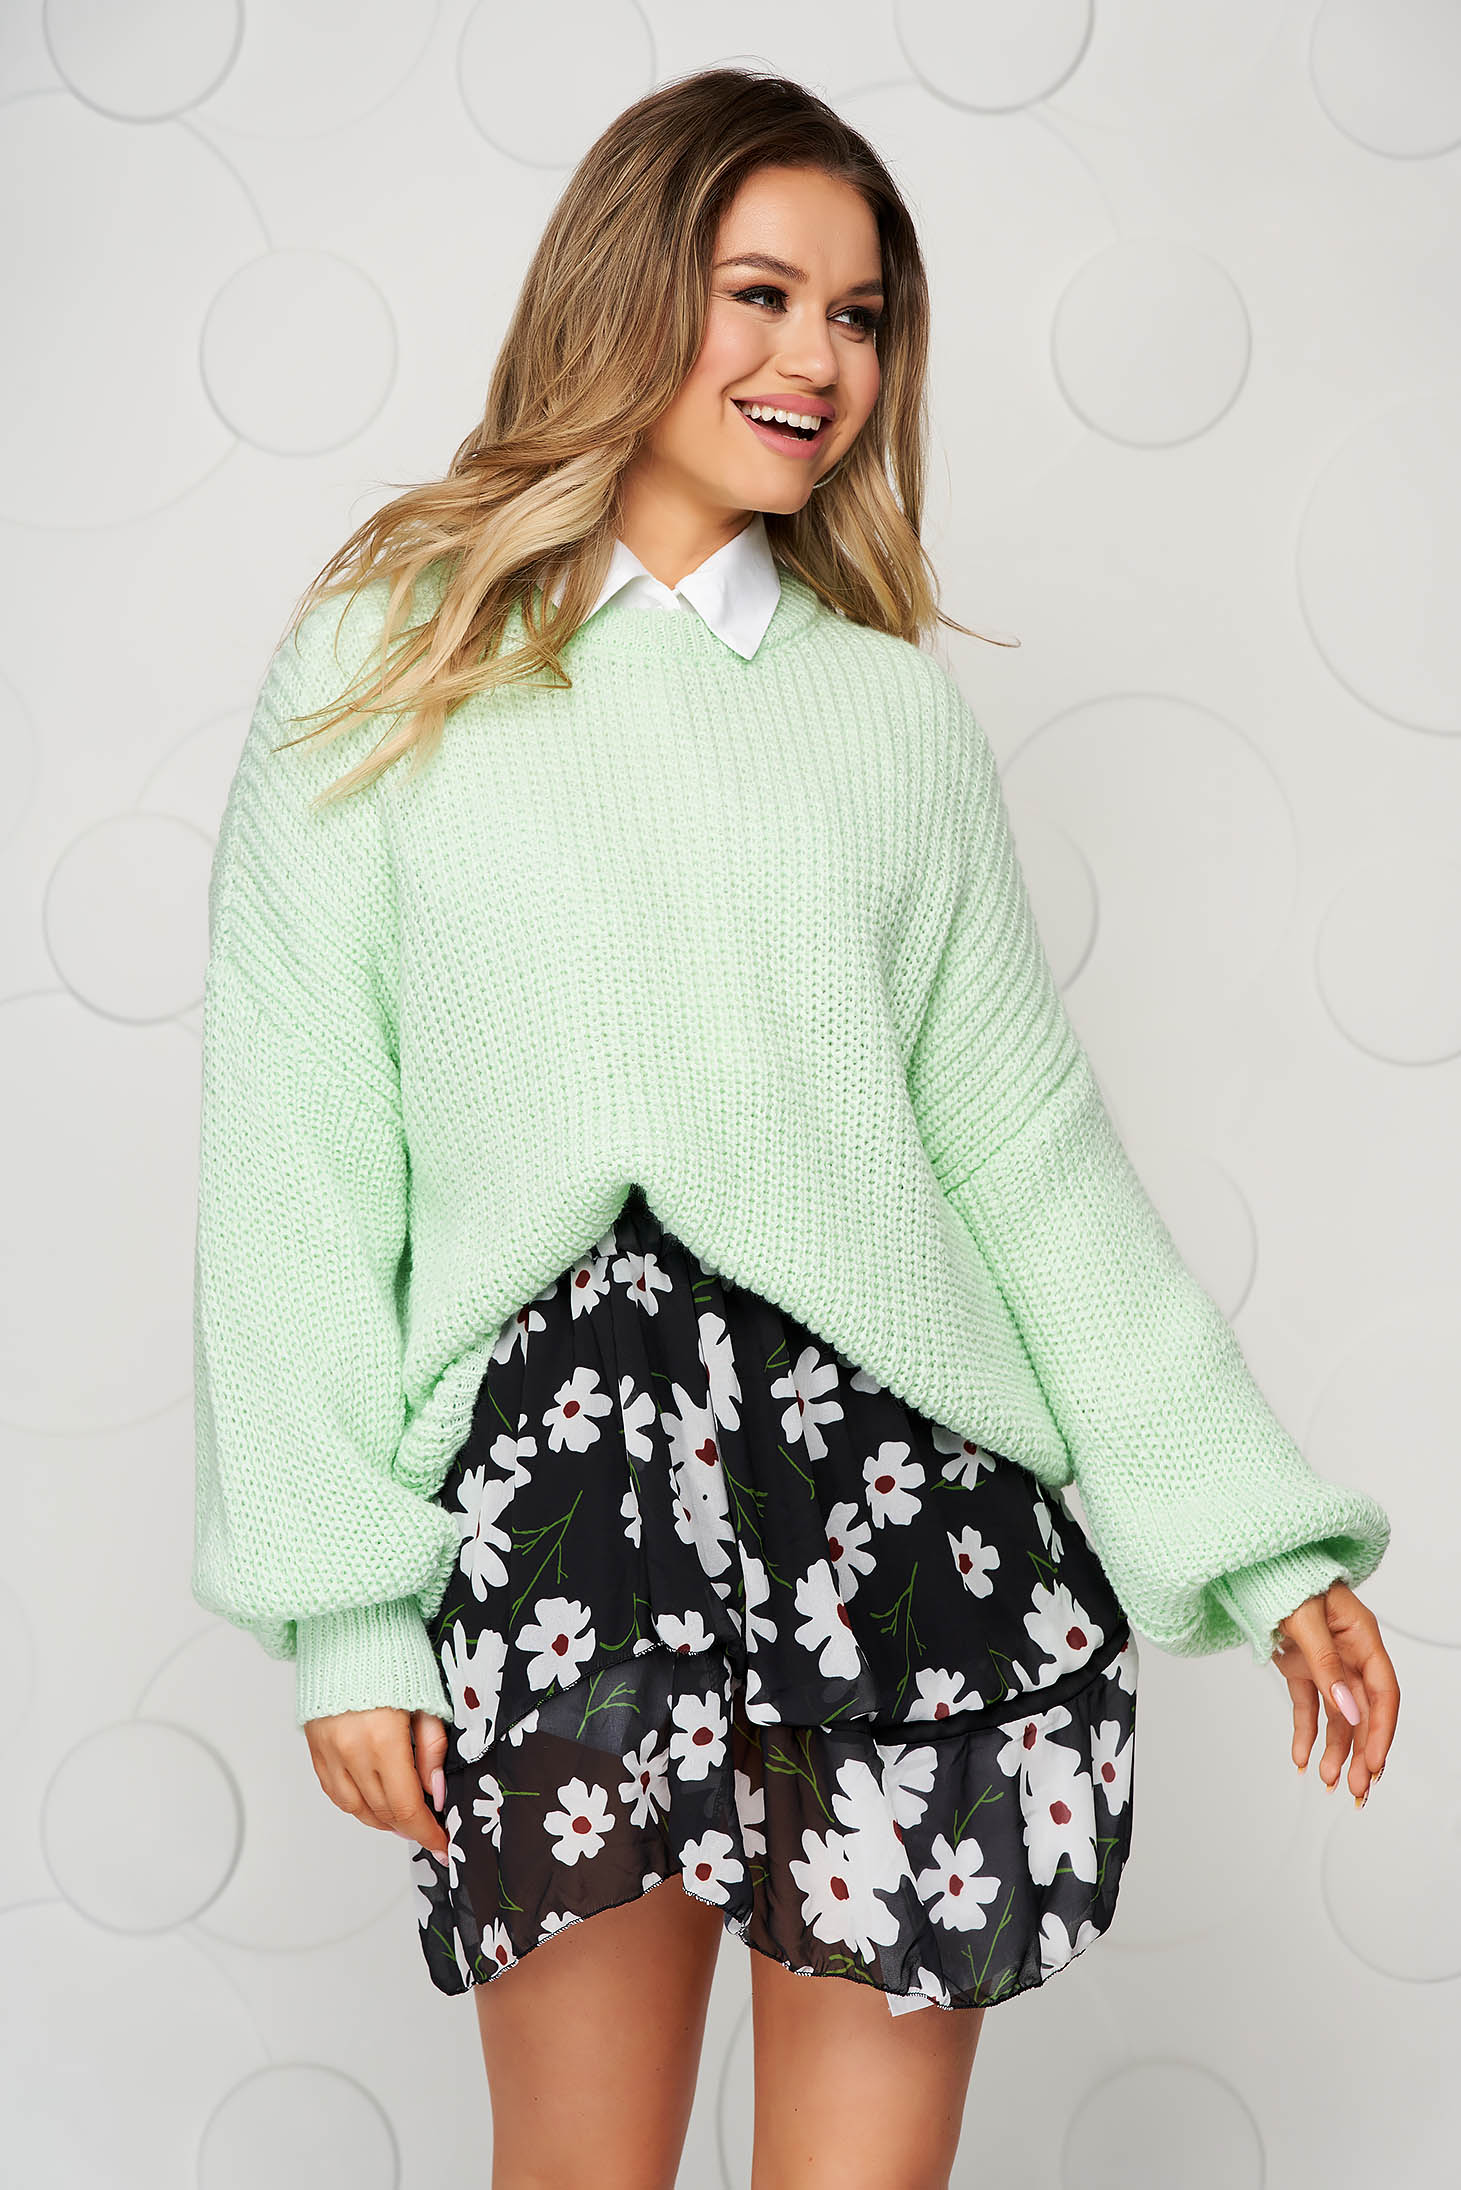 Pulover SunShine verde-deschis tricotat cu maneci bufante si cu croi larg